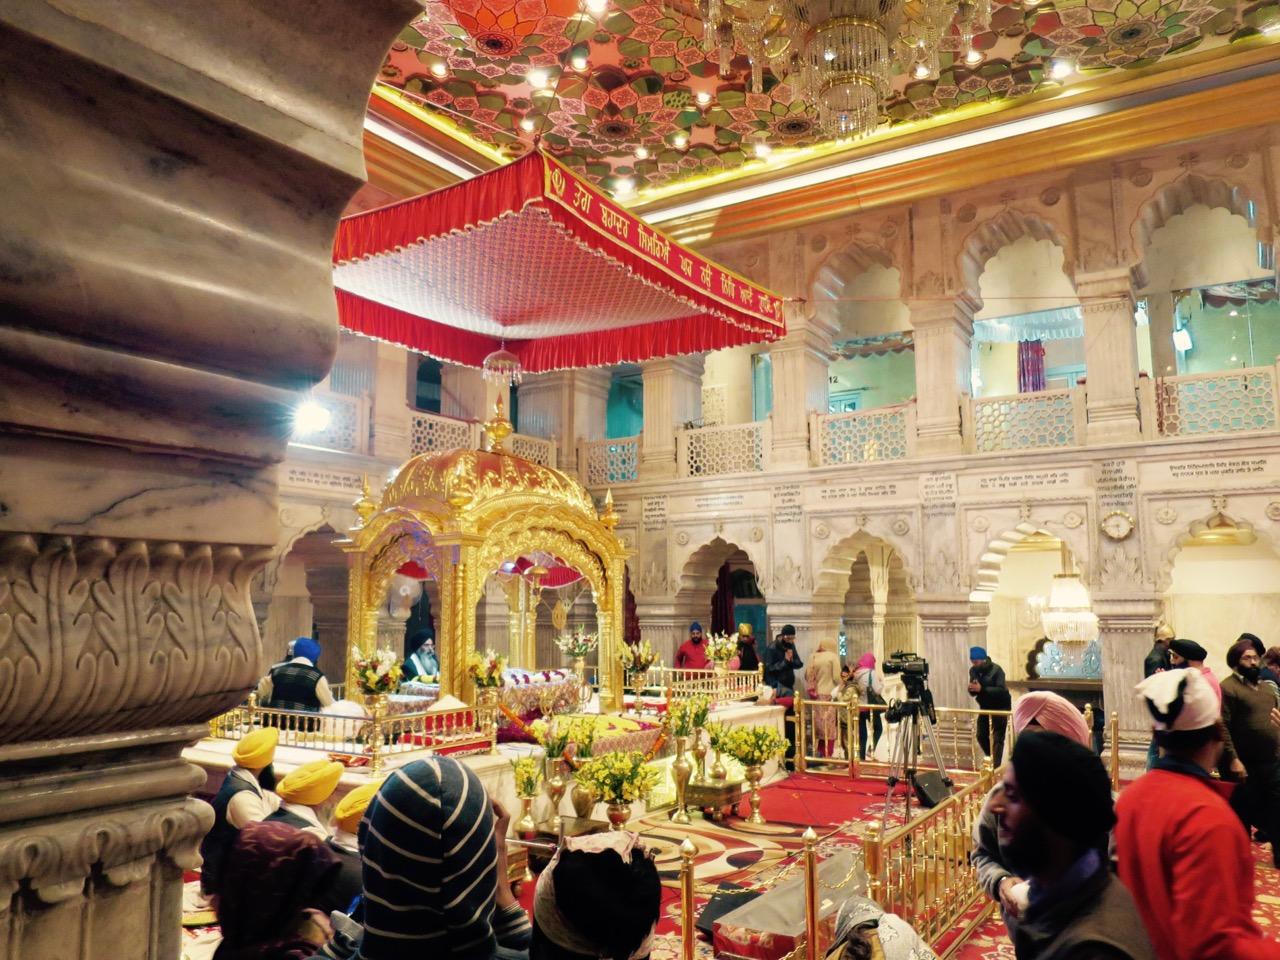 Northern India Photo Diary: A Taste Of Delhi